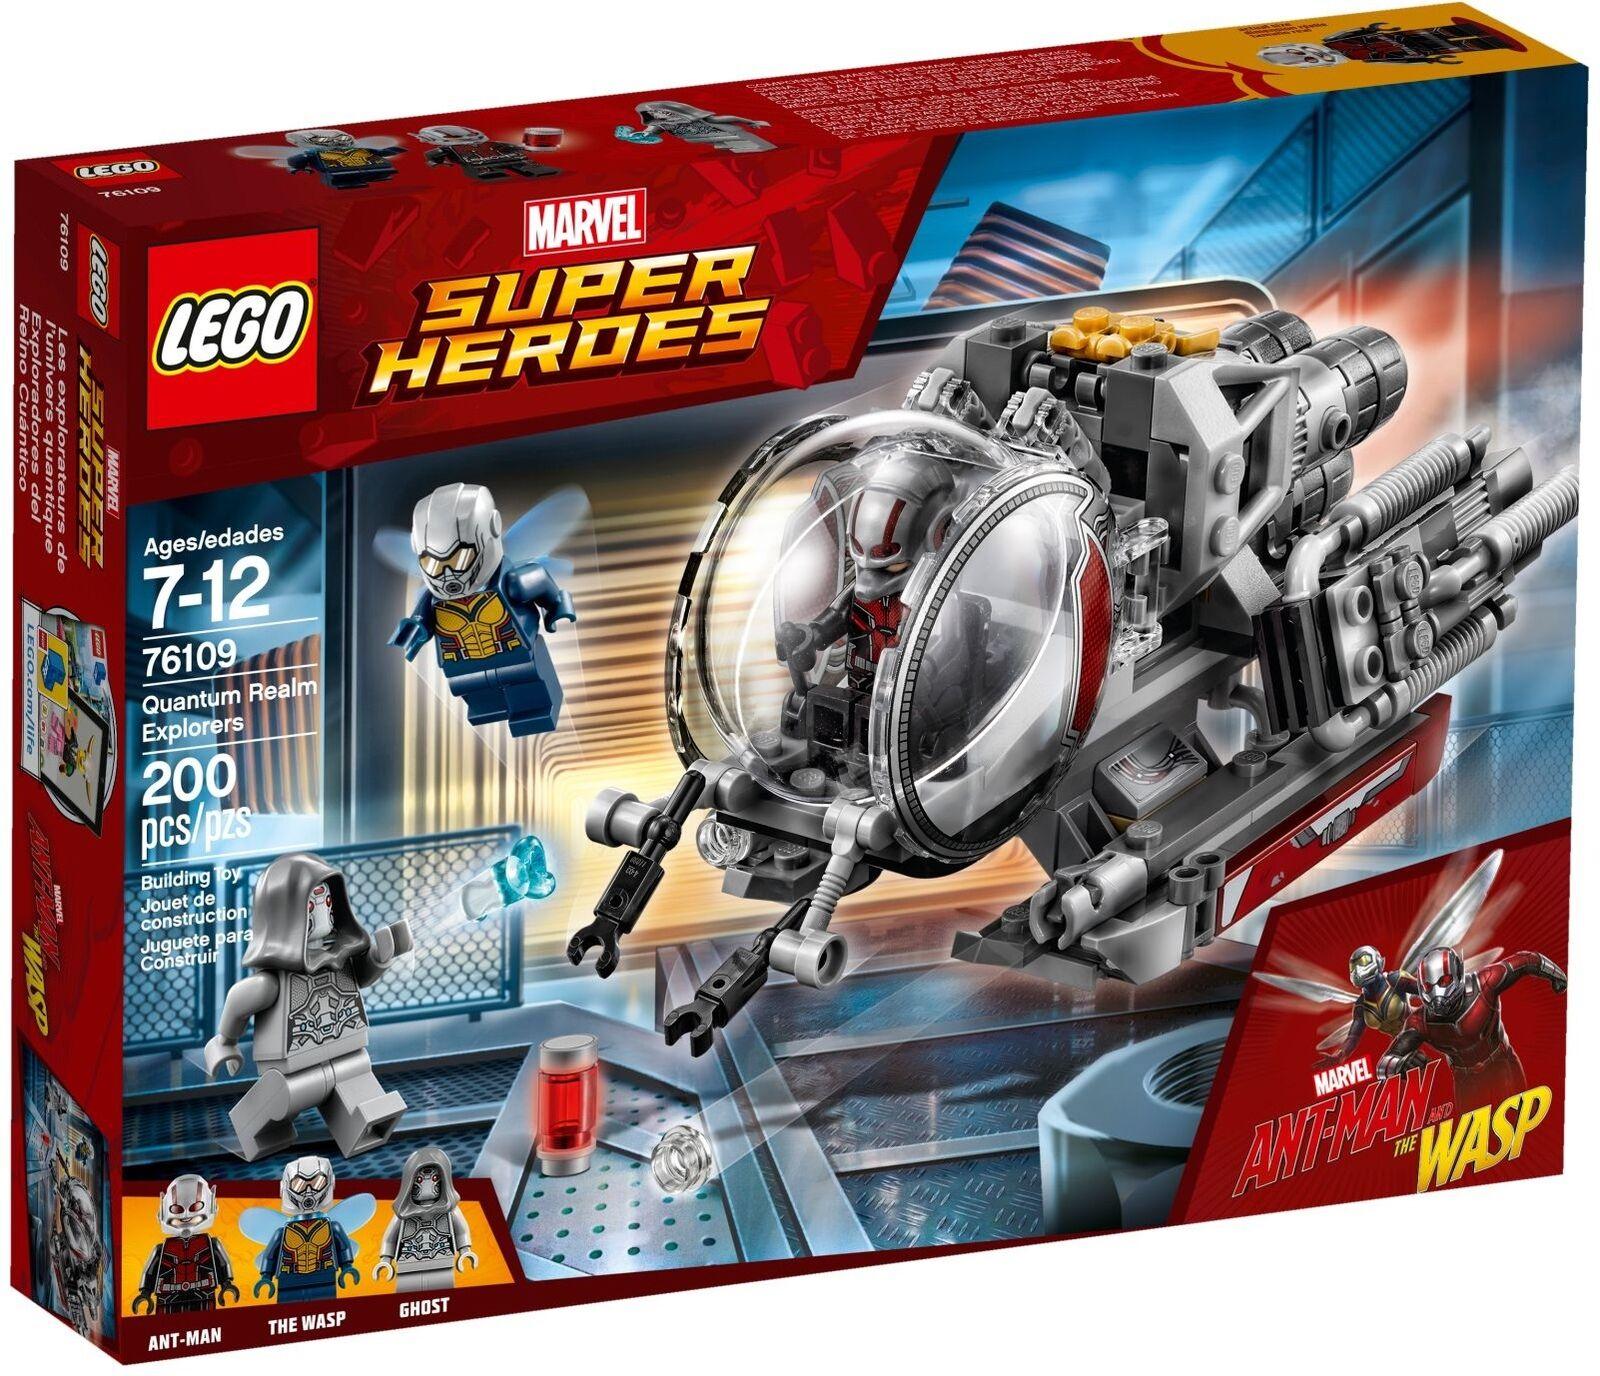 LEGO 76109 ANT-MAN WASP - QUANTUM REALM EXPLORERS - SUPERHEROES NEW